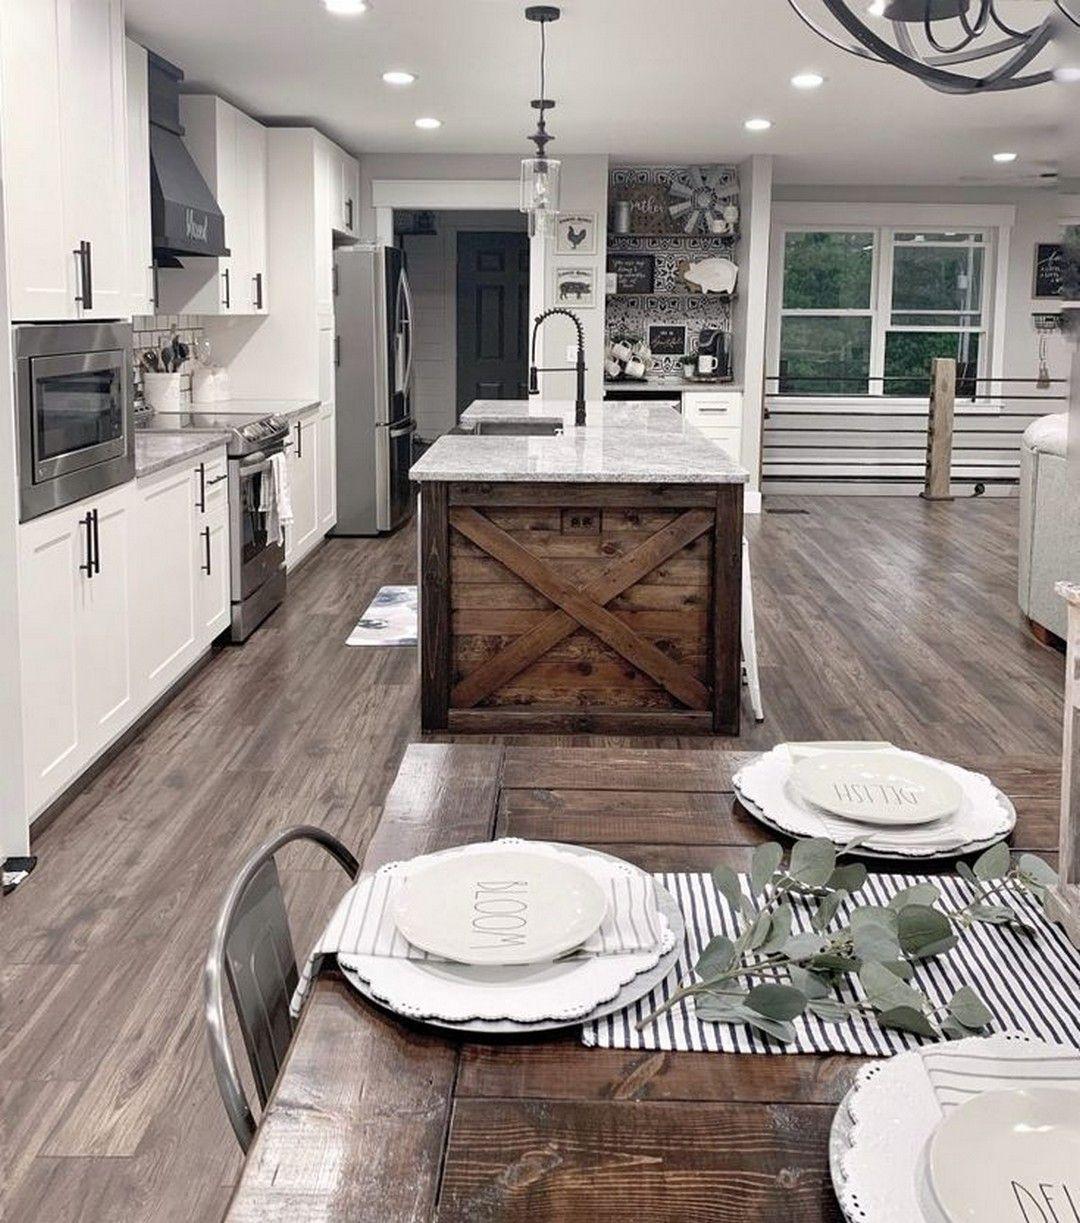 10 Modern Farmhouse Home Tour #modernfarmhouselivingroom